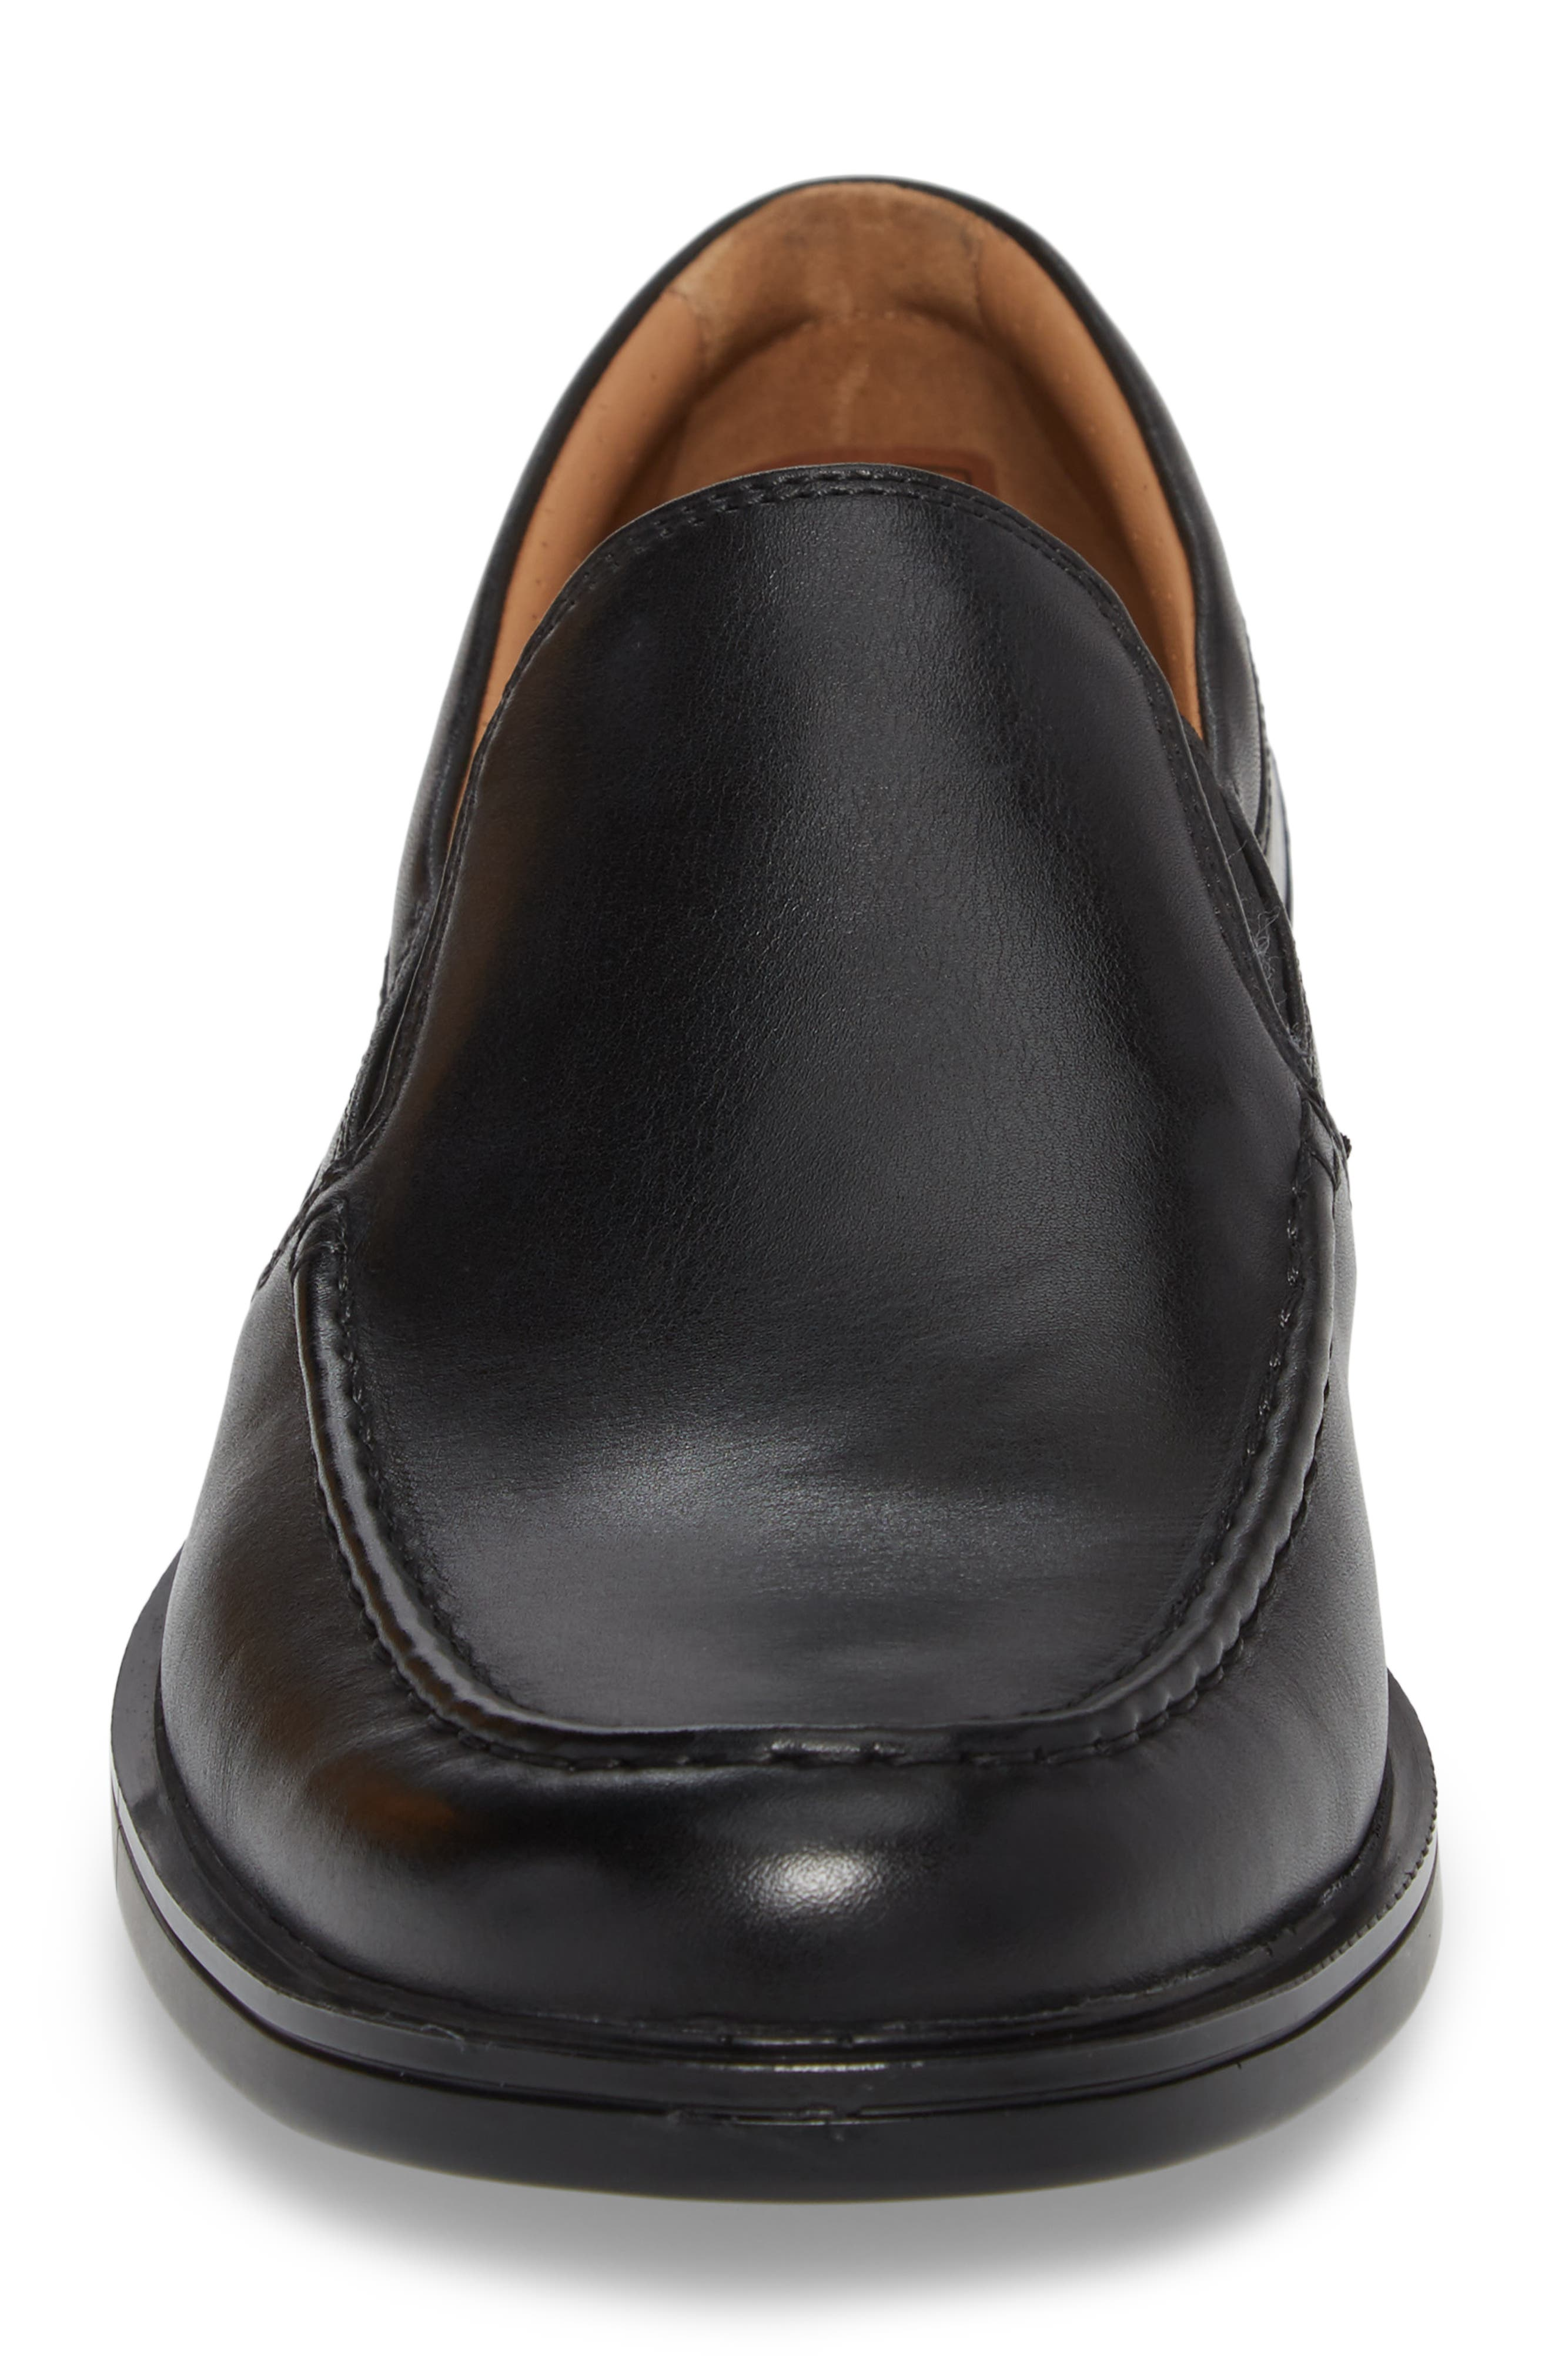 Unaldric Apron Toe Loafer,                             Alternate thumbnail 4, color,                             Black Leather